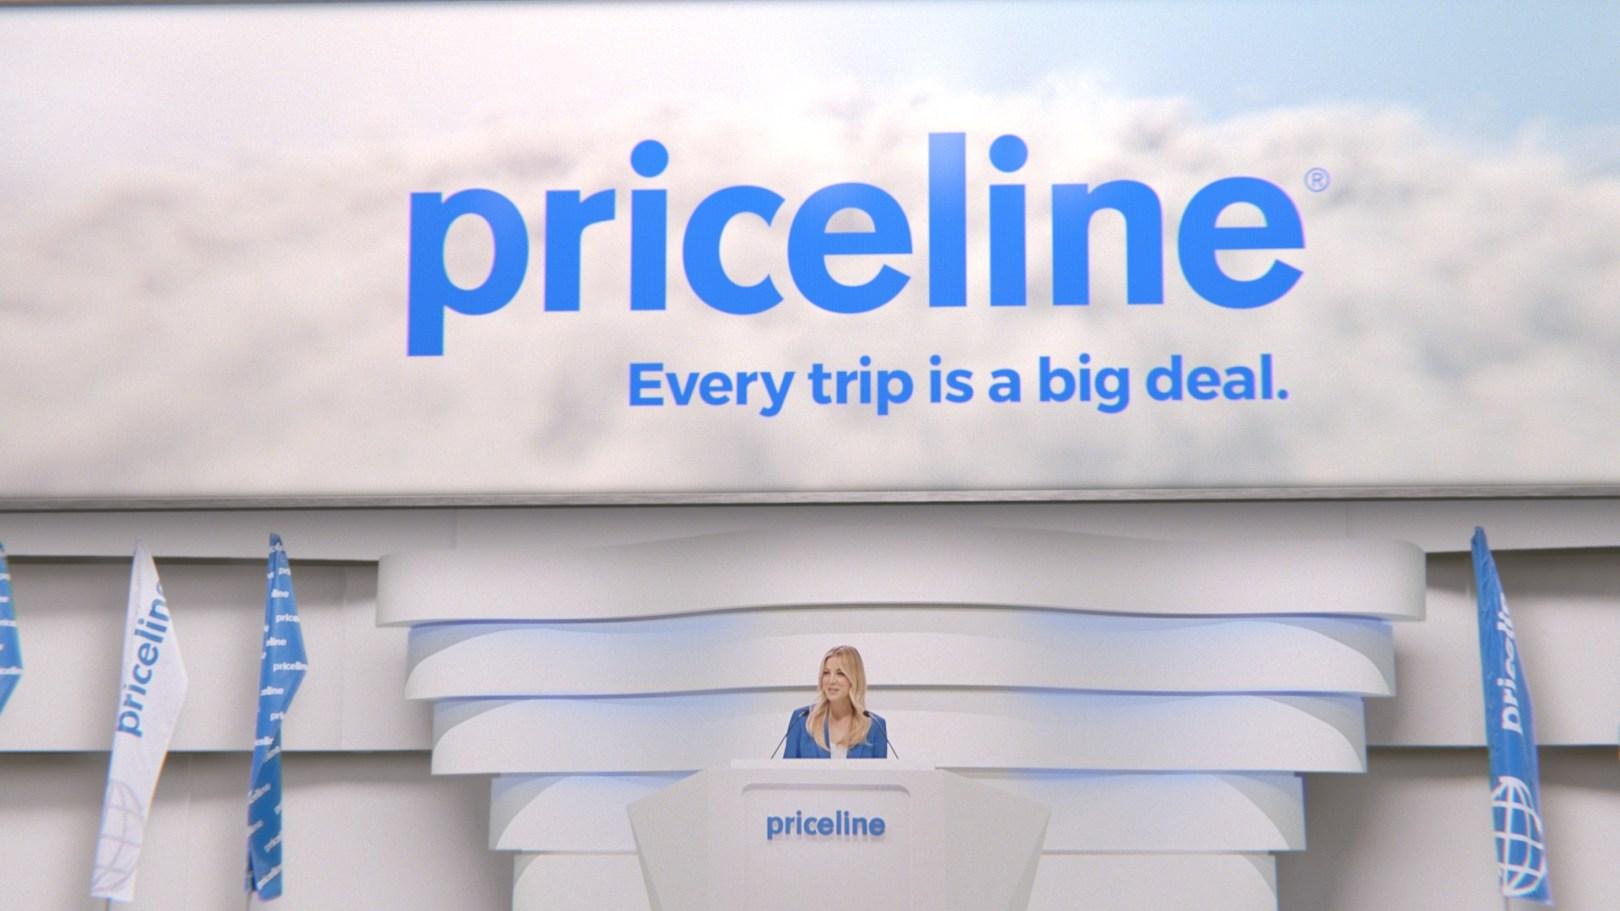 Priceline chooses Grip Limited for U.S. creative ...